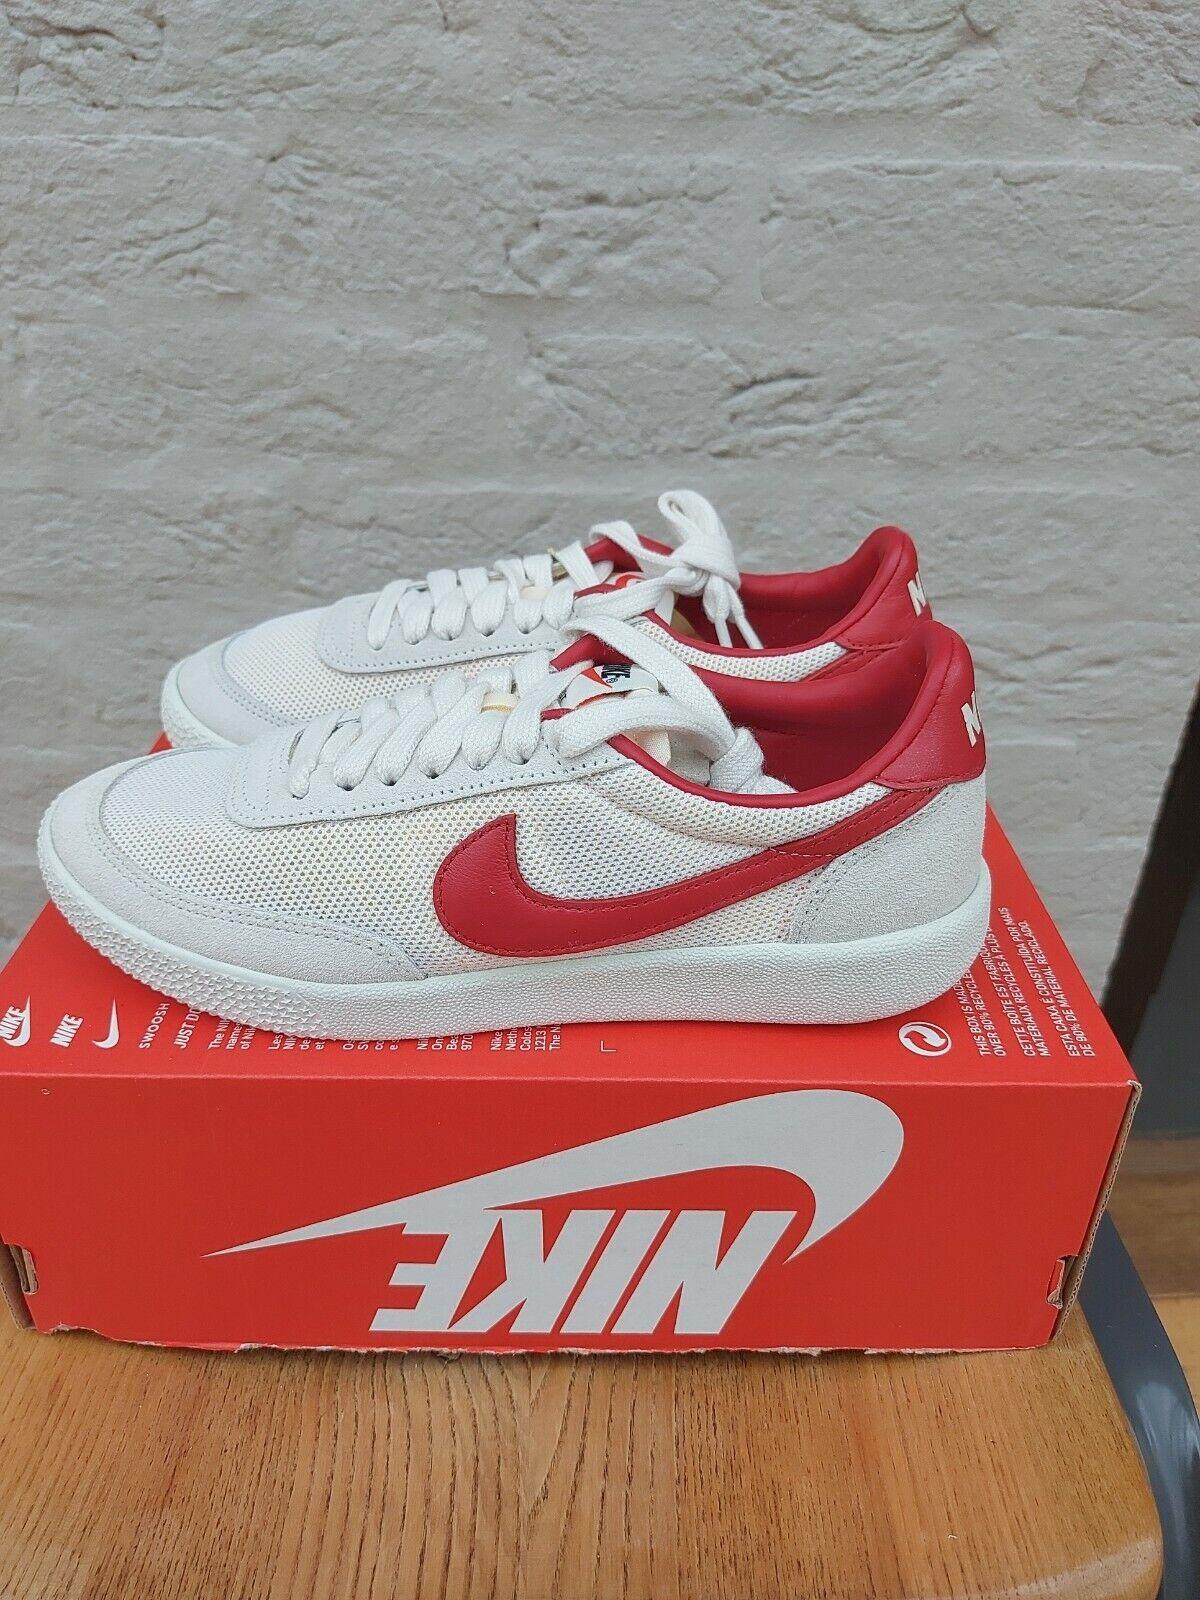 Nike mortel OG SP. UK4.5. EU37.5. Neuf avec boîte (boîte n'a pas de couvercle)